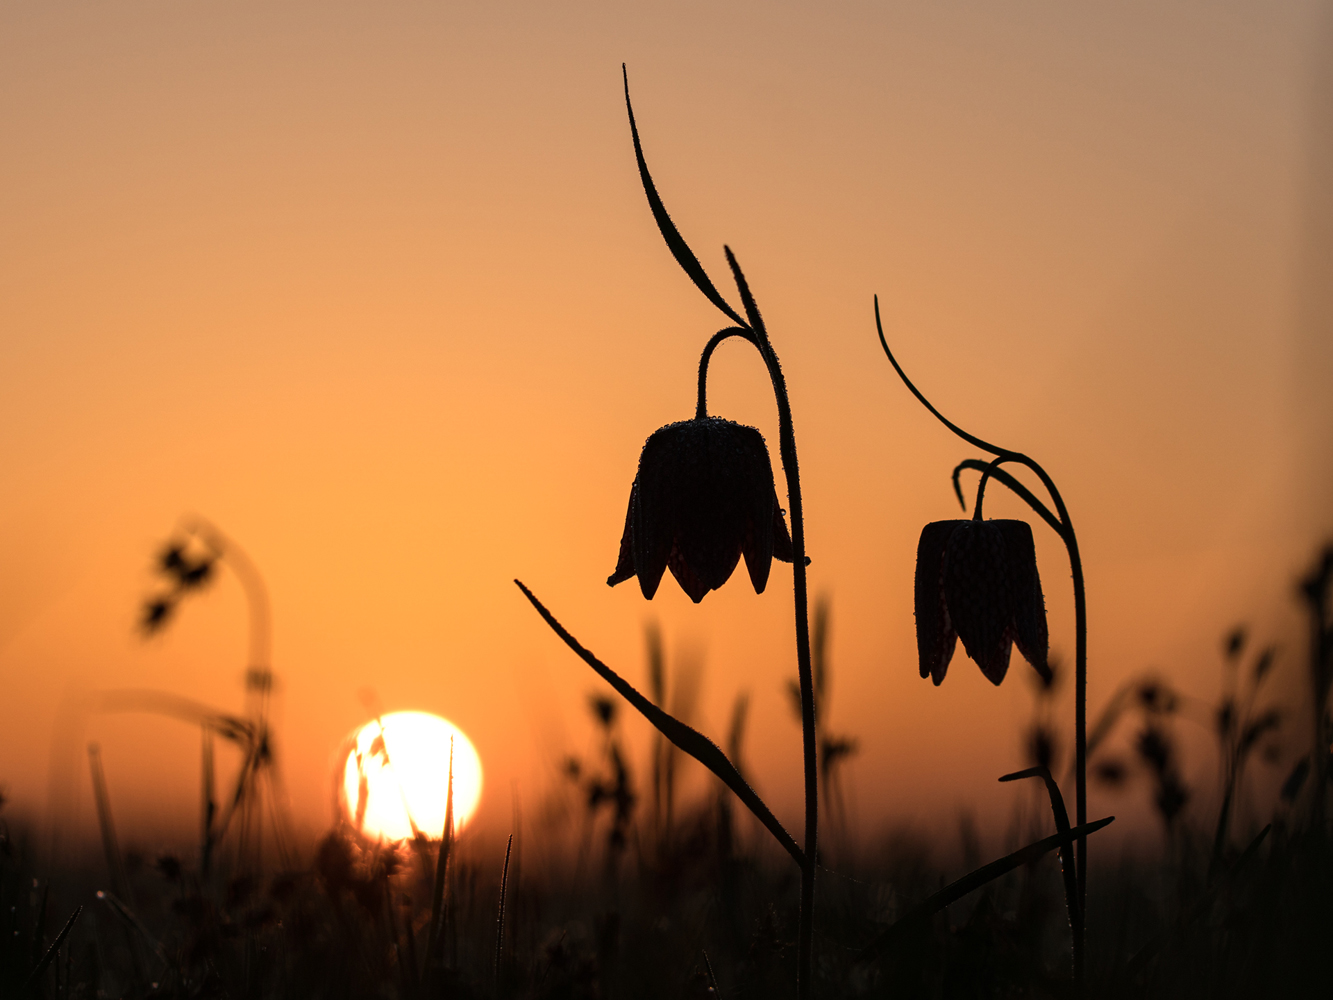 Kievitsbloemen bij zonsopkomstddn